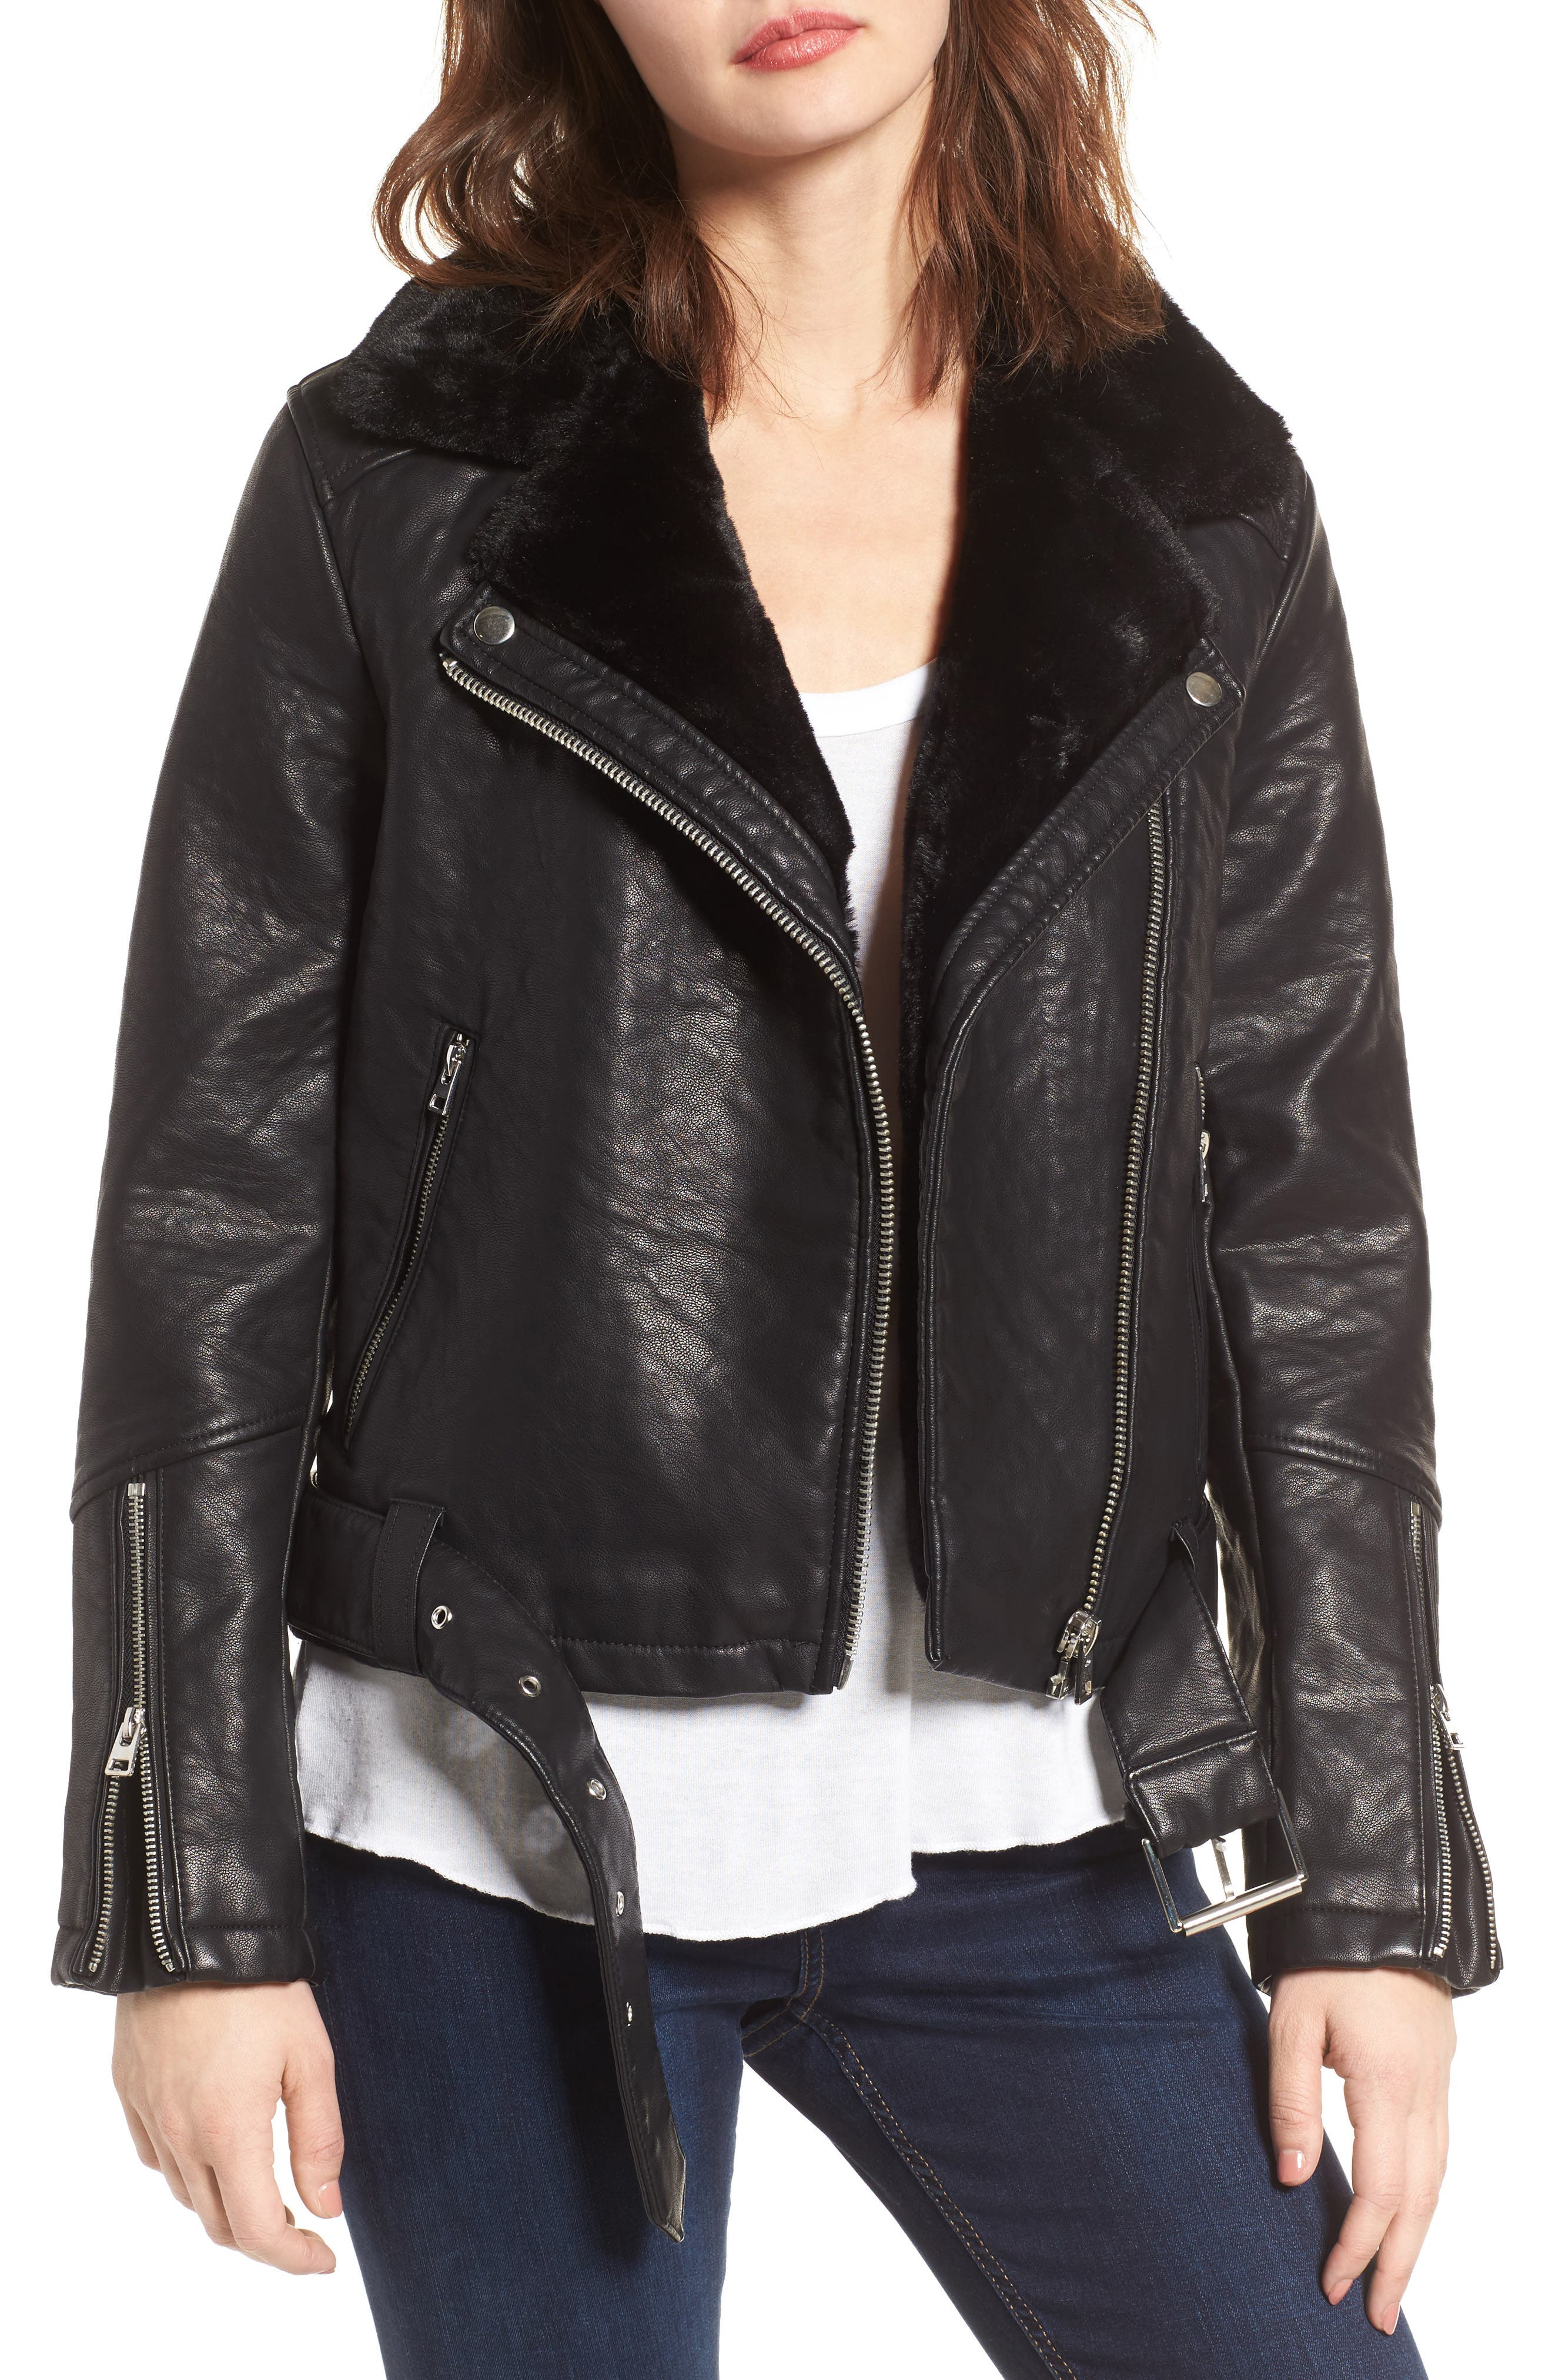 Alternate Image 1 Selected - Topshop Vardy Faux Leather Biker Jacket